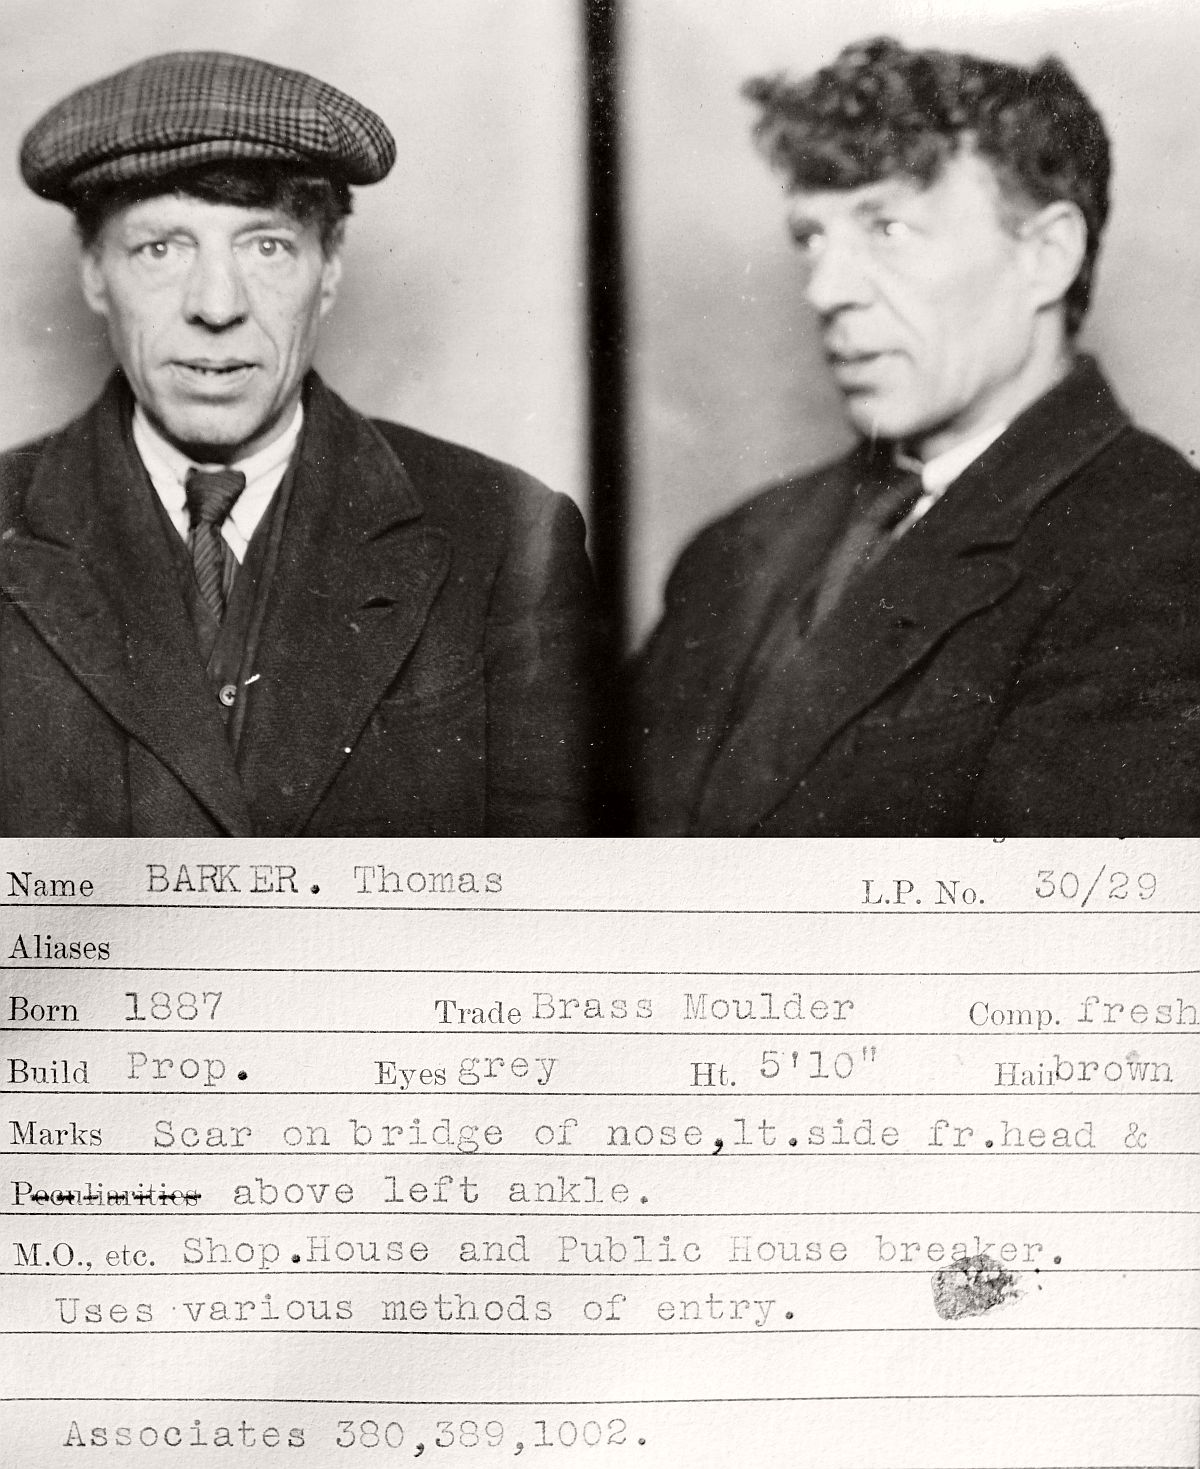 vintage-mug-shot-of-criminals-from-newcastle-upon-tyne-1930s-15